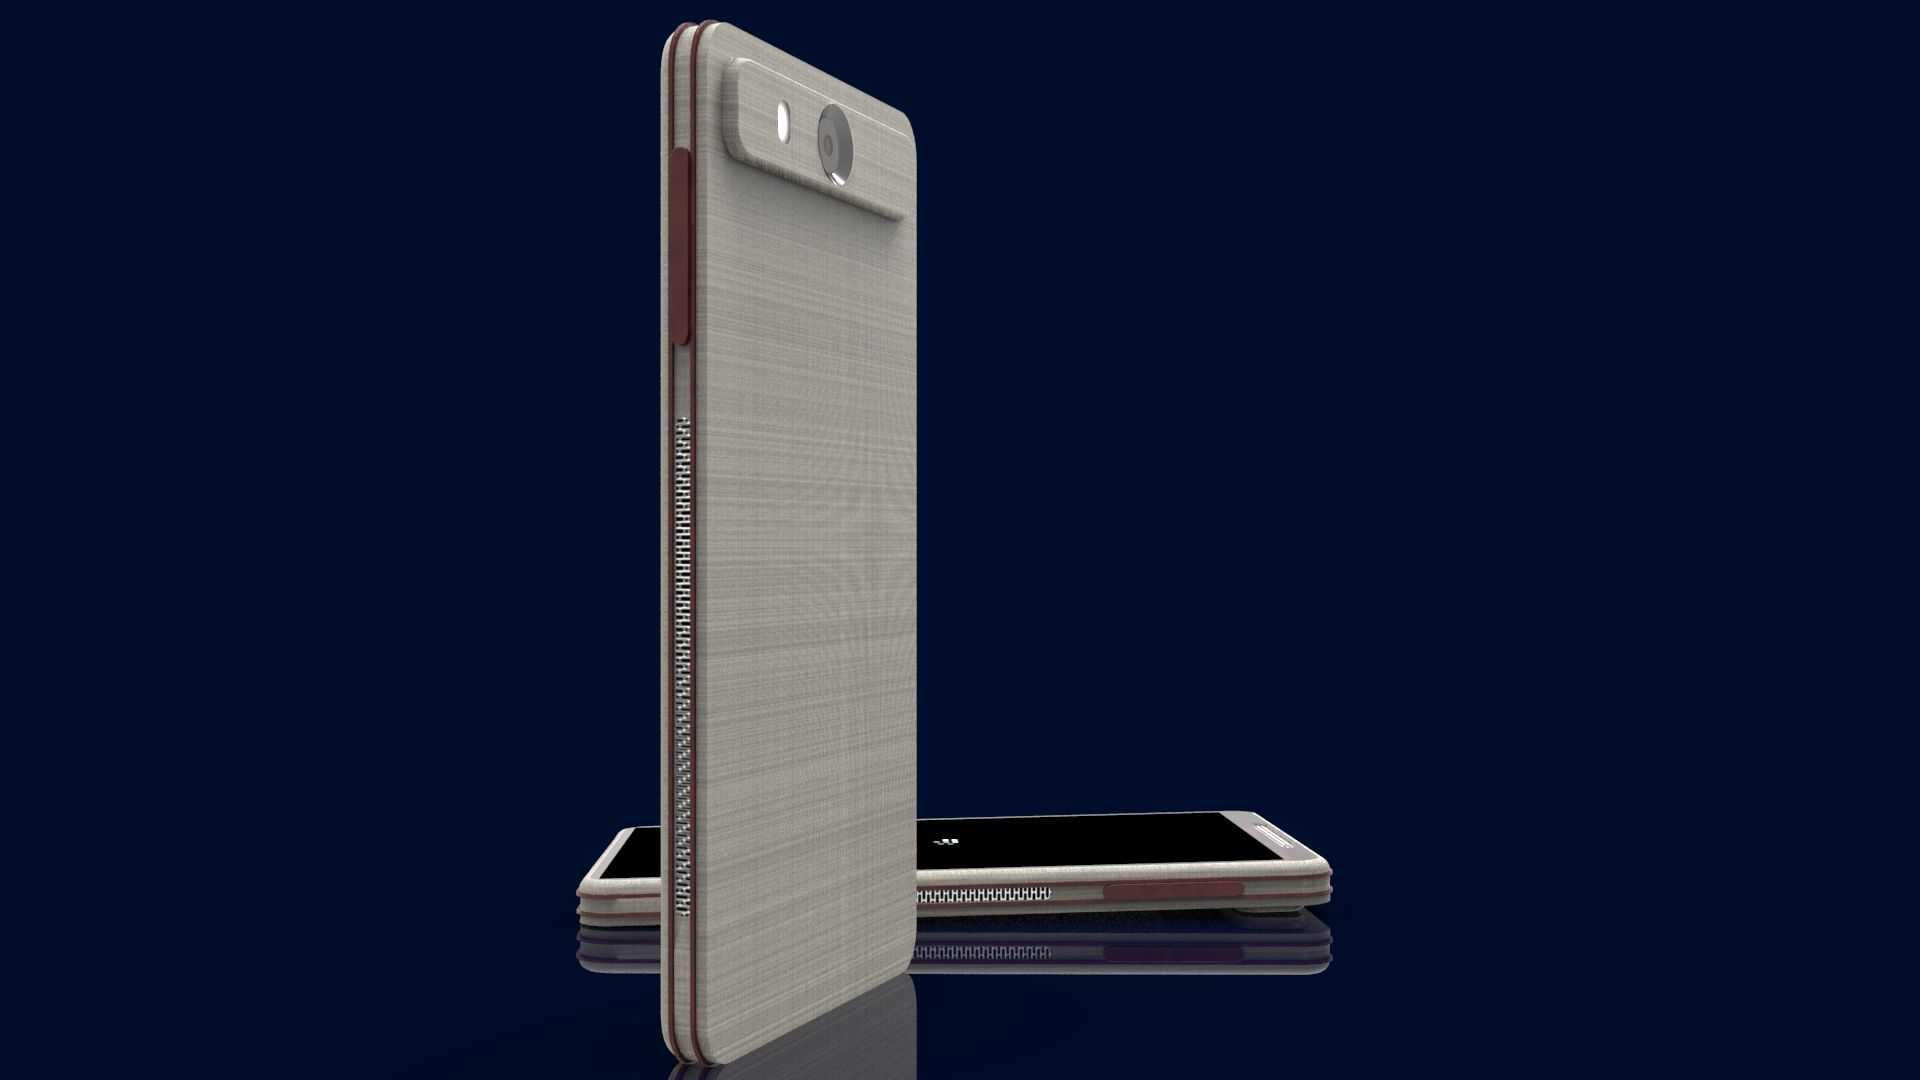 Bb-phone-42-3500-3500